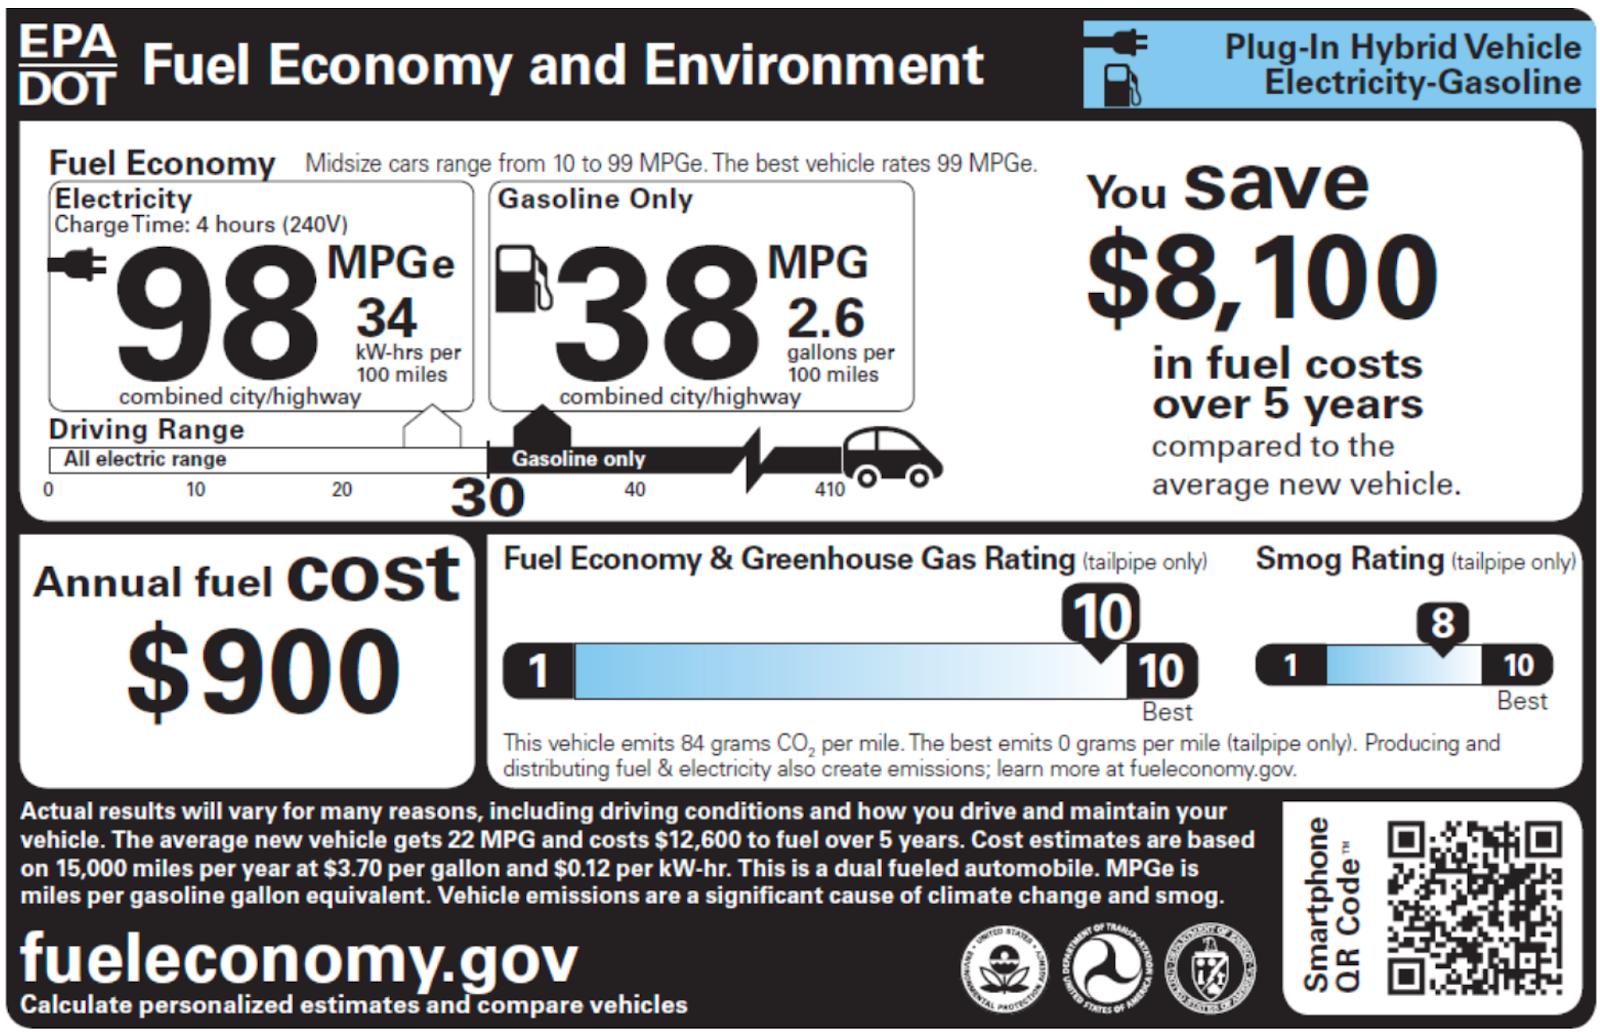 Fuel economy mpge sticker